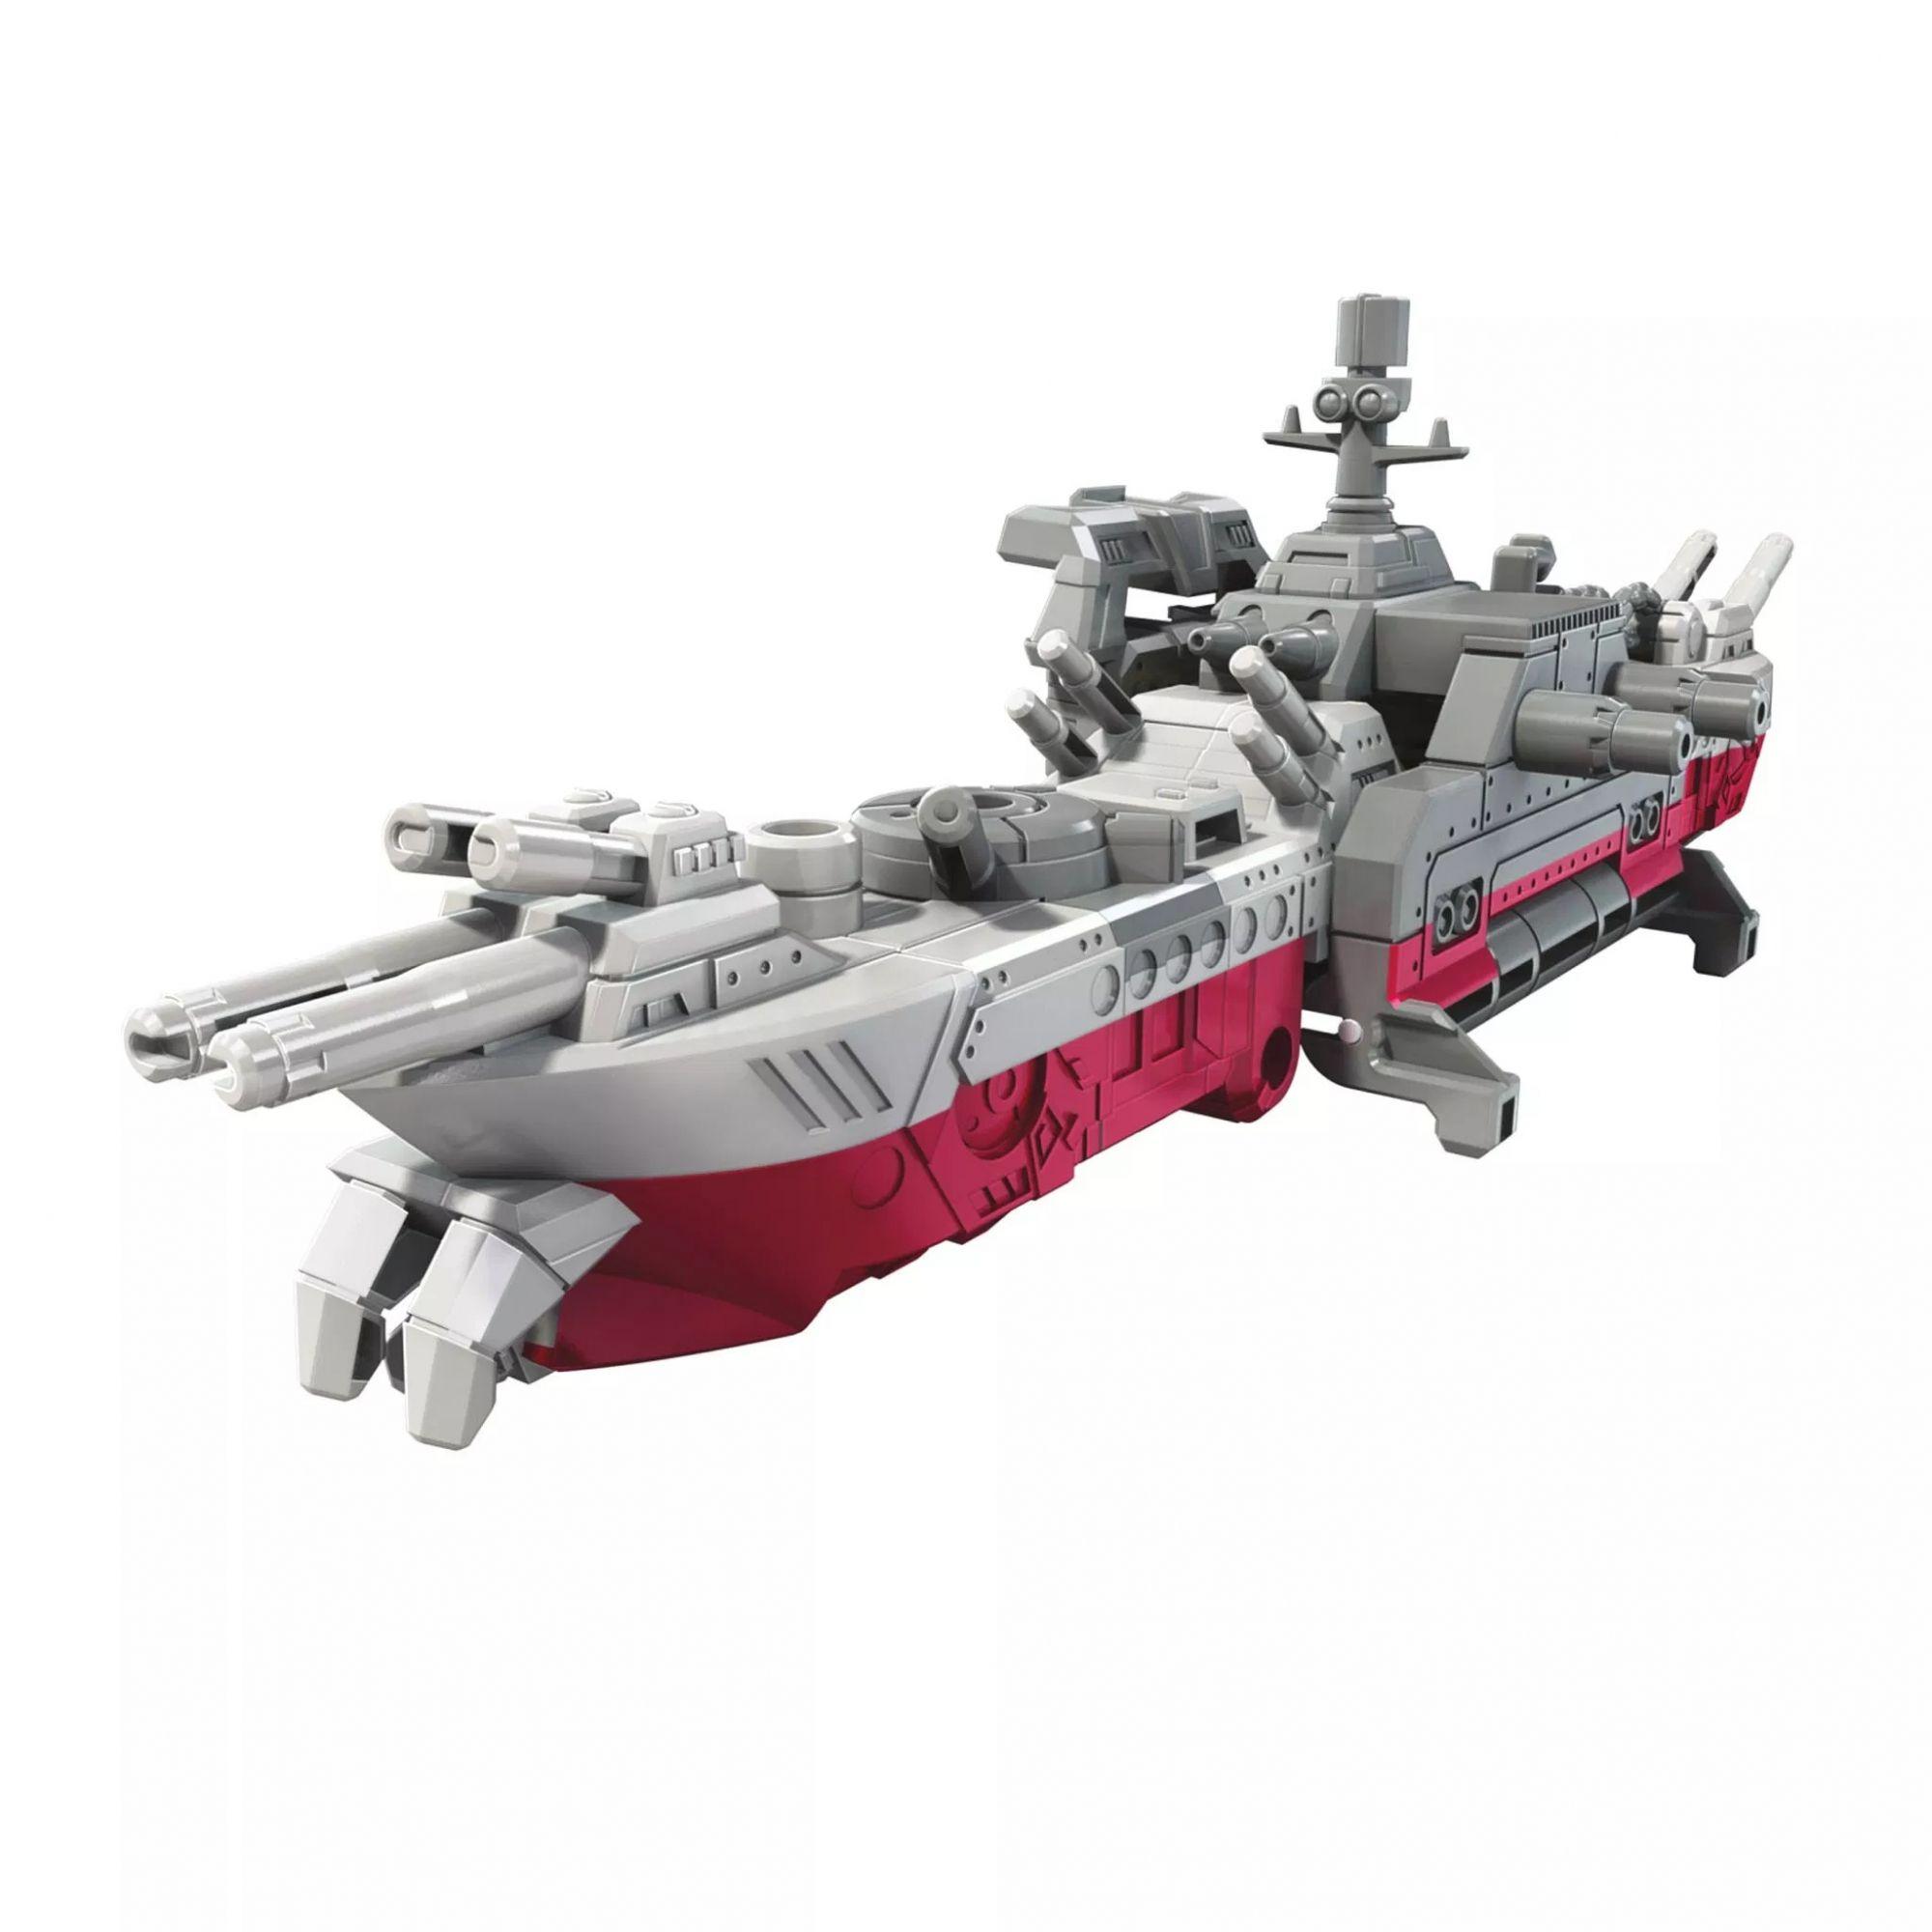 Transformers Cyberverse Spark Armor  - Bumblebee e Ocean Storm - Hasbro  - Doce Diversão